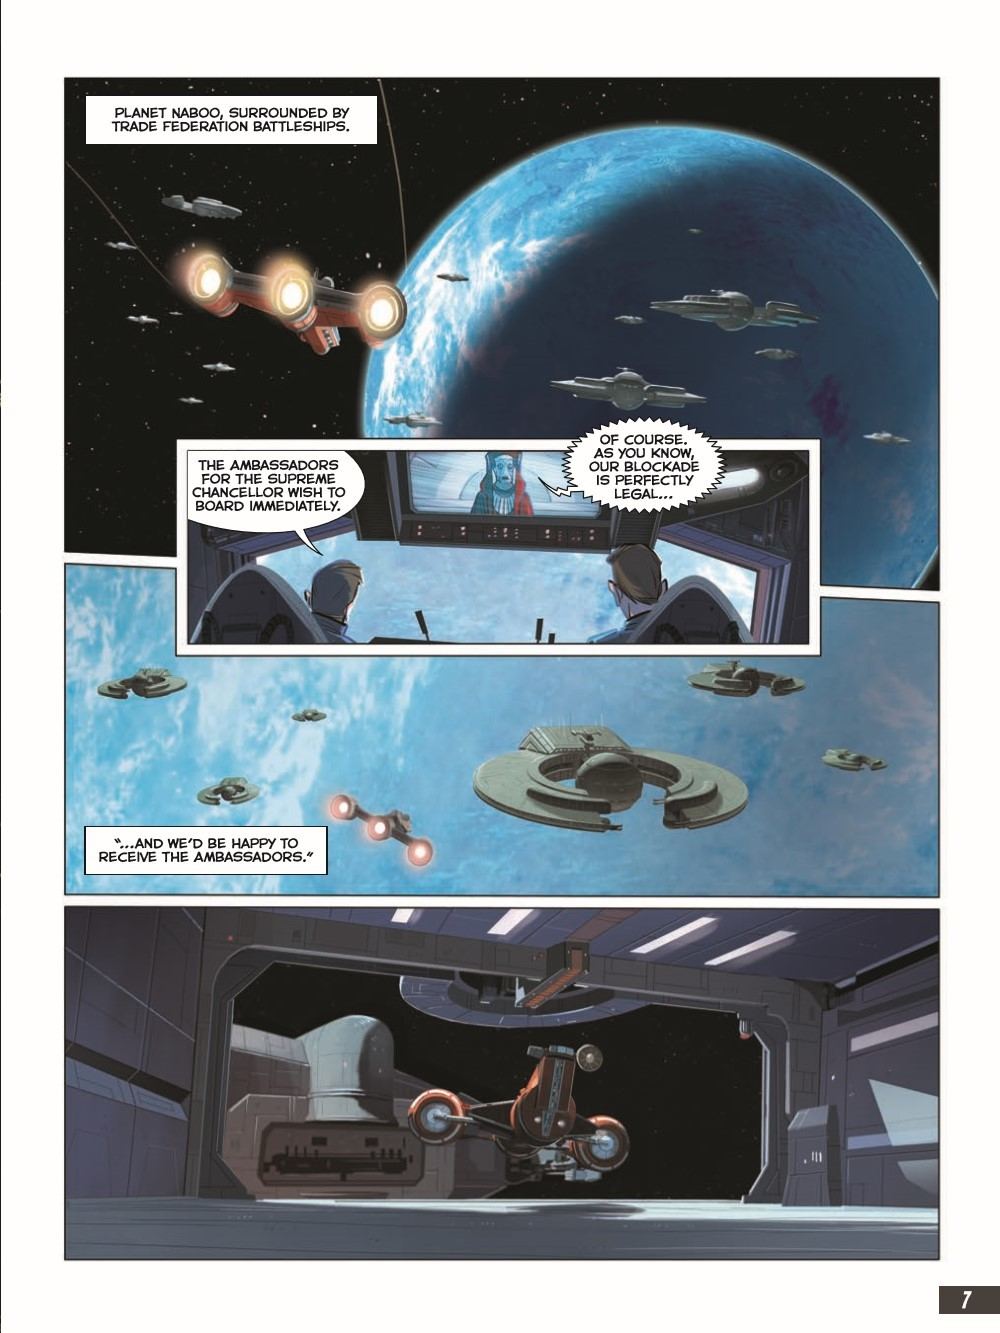 SW_The-Phantom-Menace_pr-3 ComicList Previews: STAR WARS THE PHANTOM MENACE GRAPHIC NOVEL ADAPTATION GN